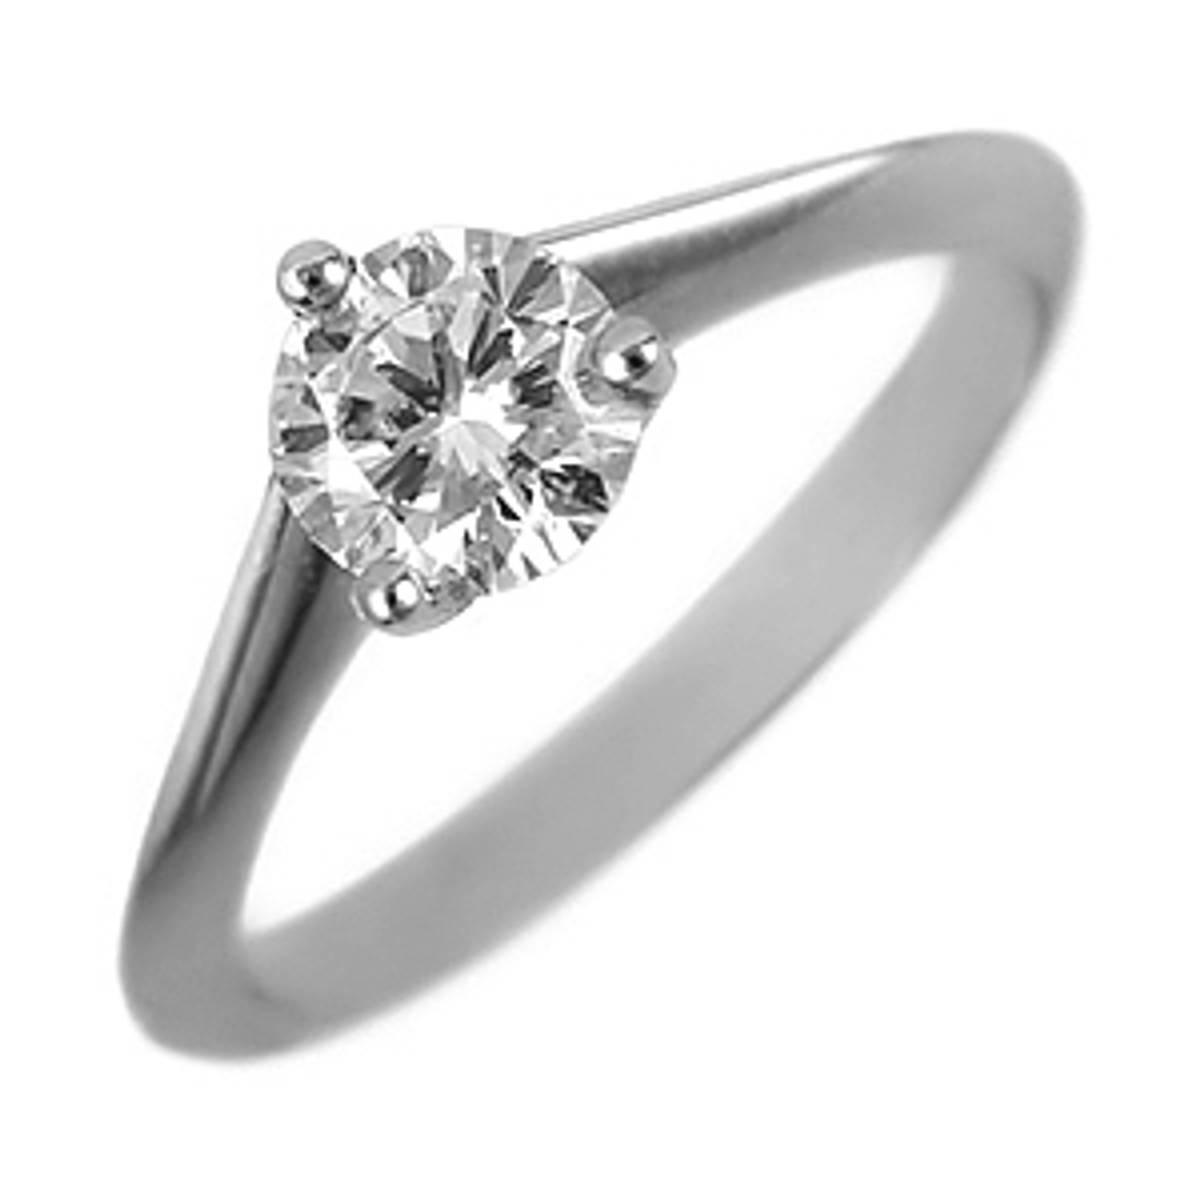 Irish made0.40ct brilliant diamond engagement ring set in 18 carat white goldColour:H/IClarity:VSI